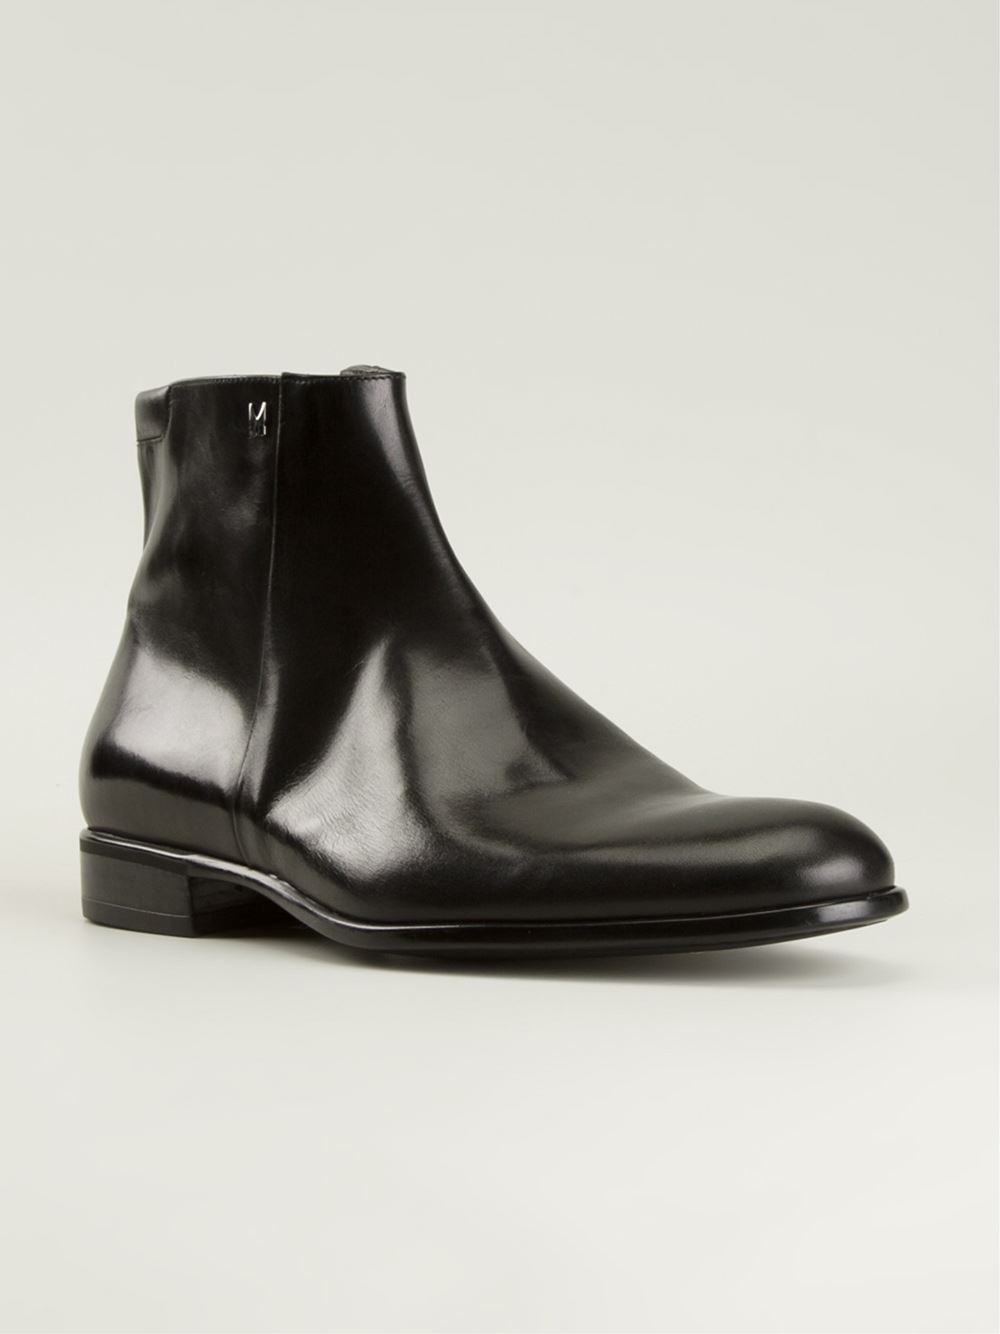 Moreschi Shoes Sale Uk